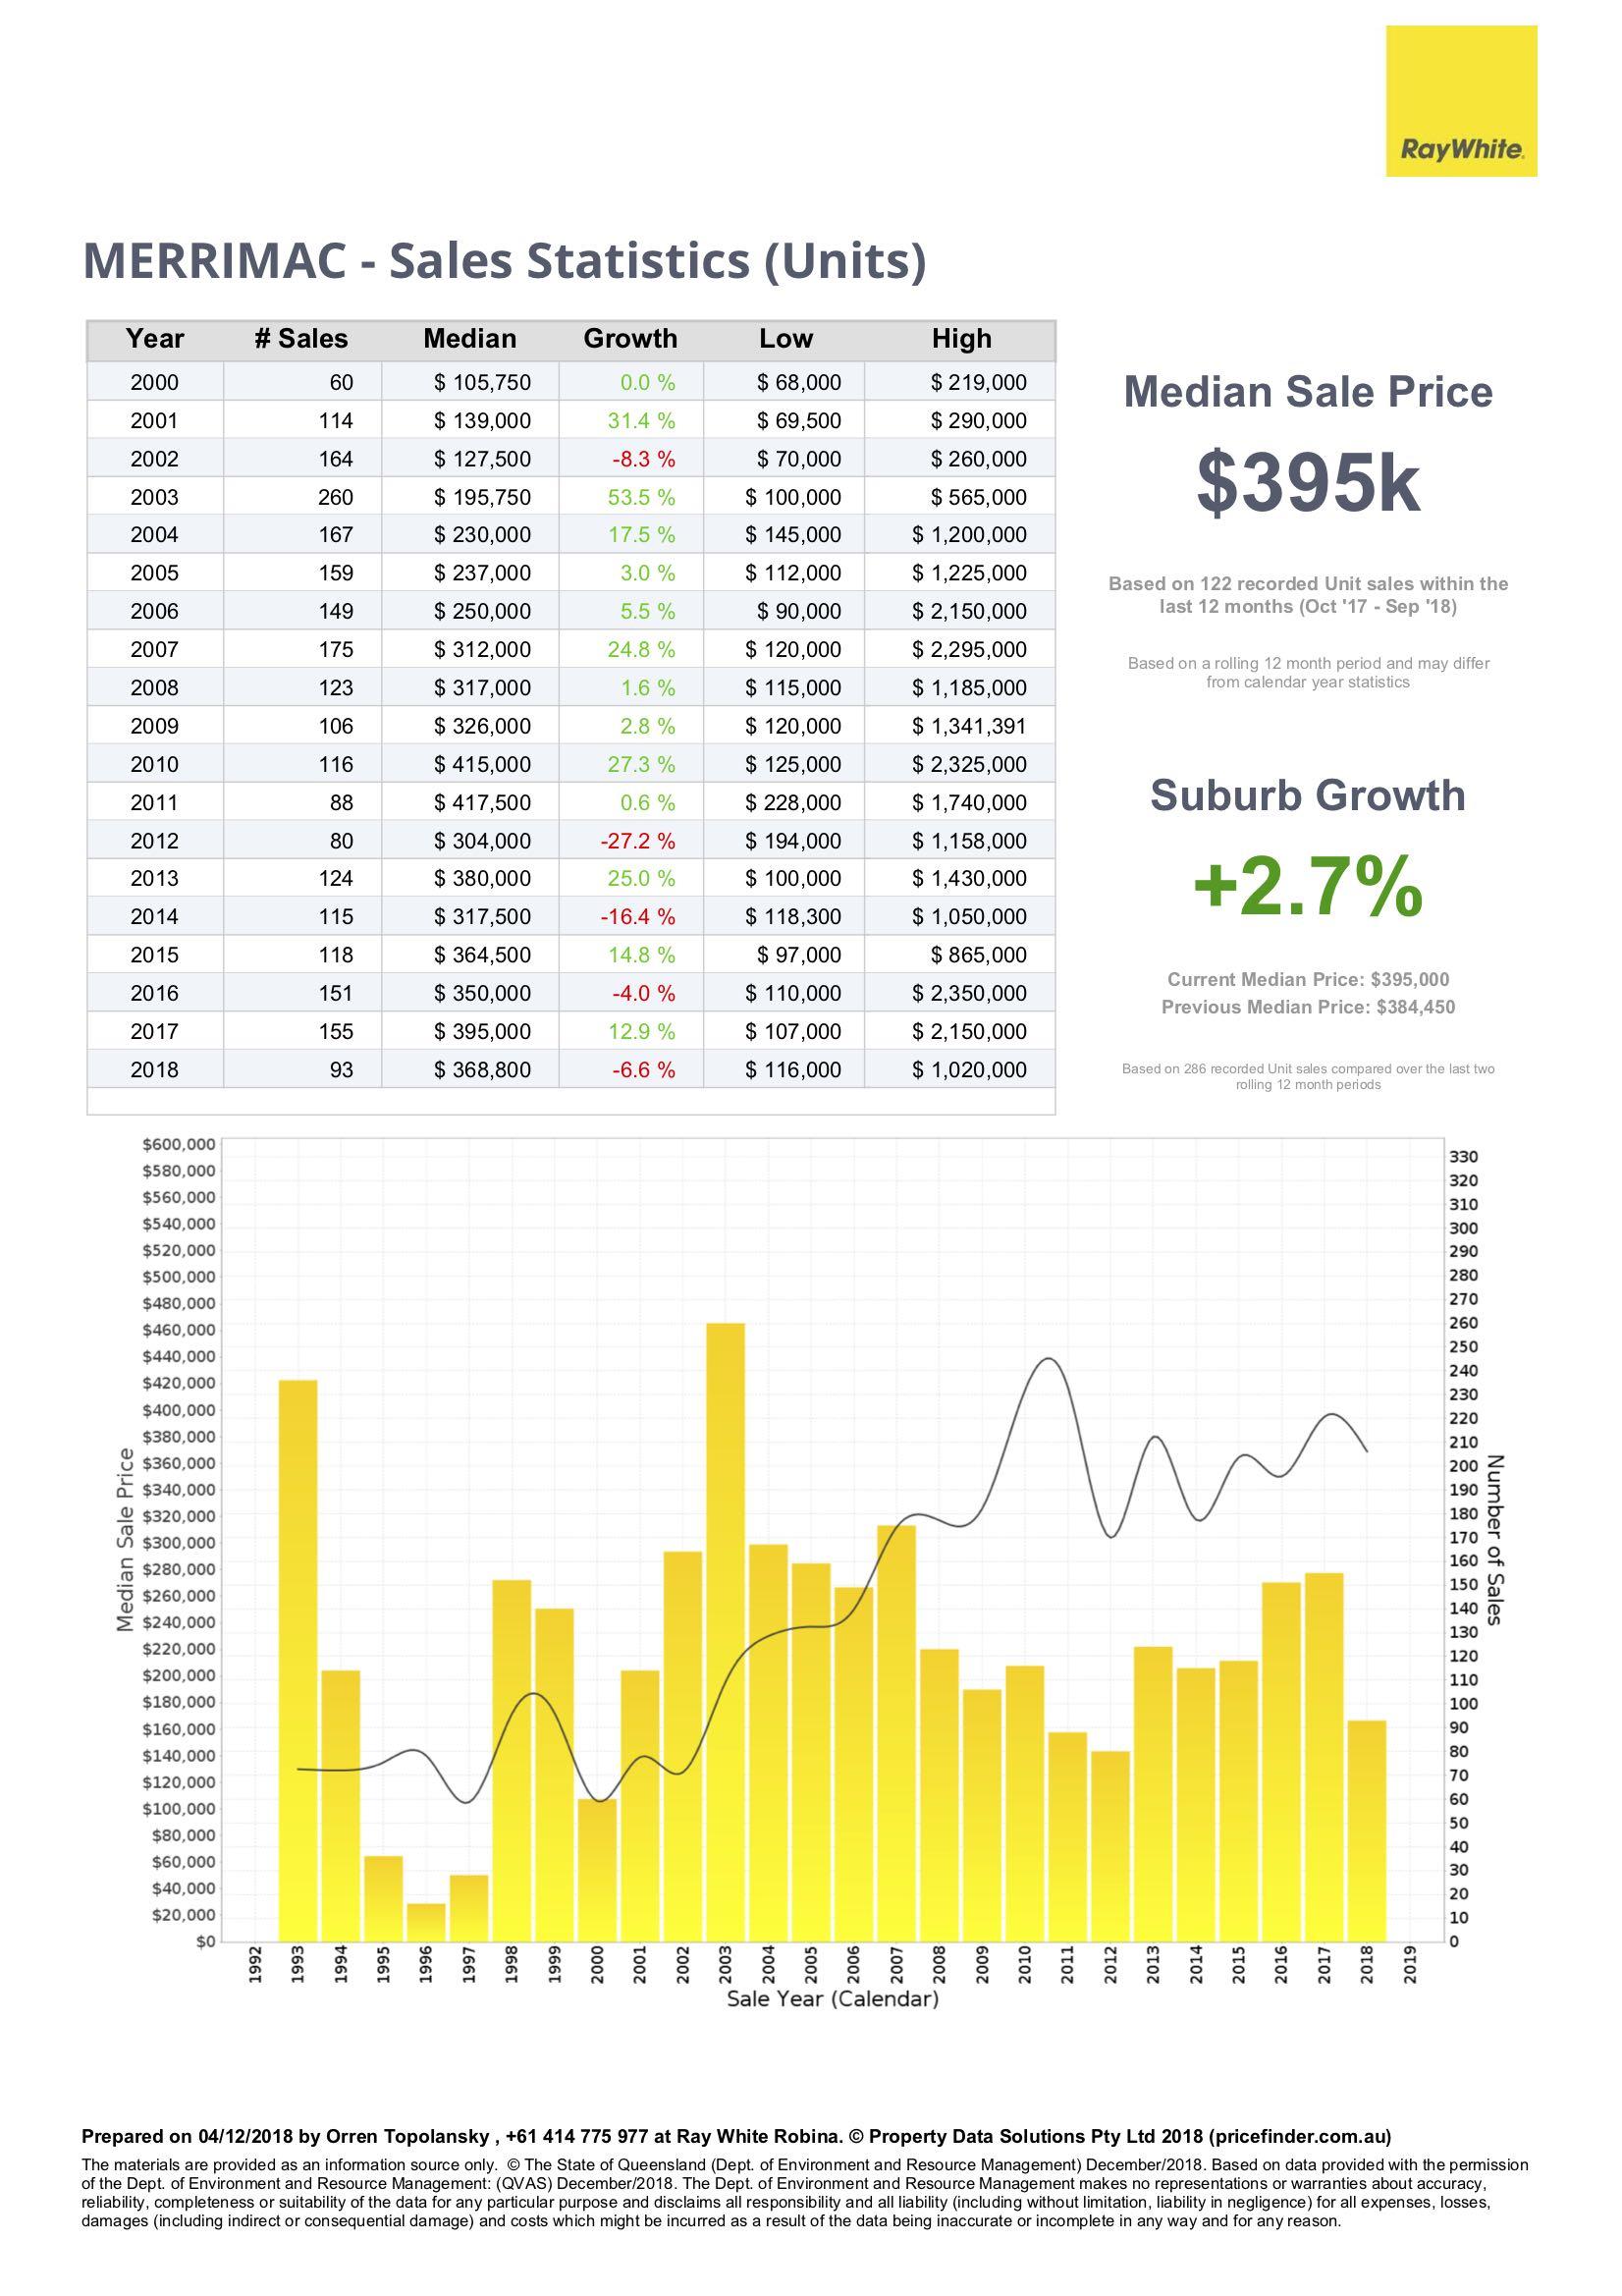 Sales statistics for units in Merrimac, Gold Coast